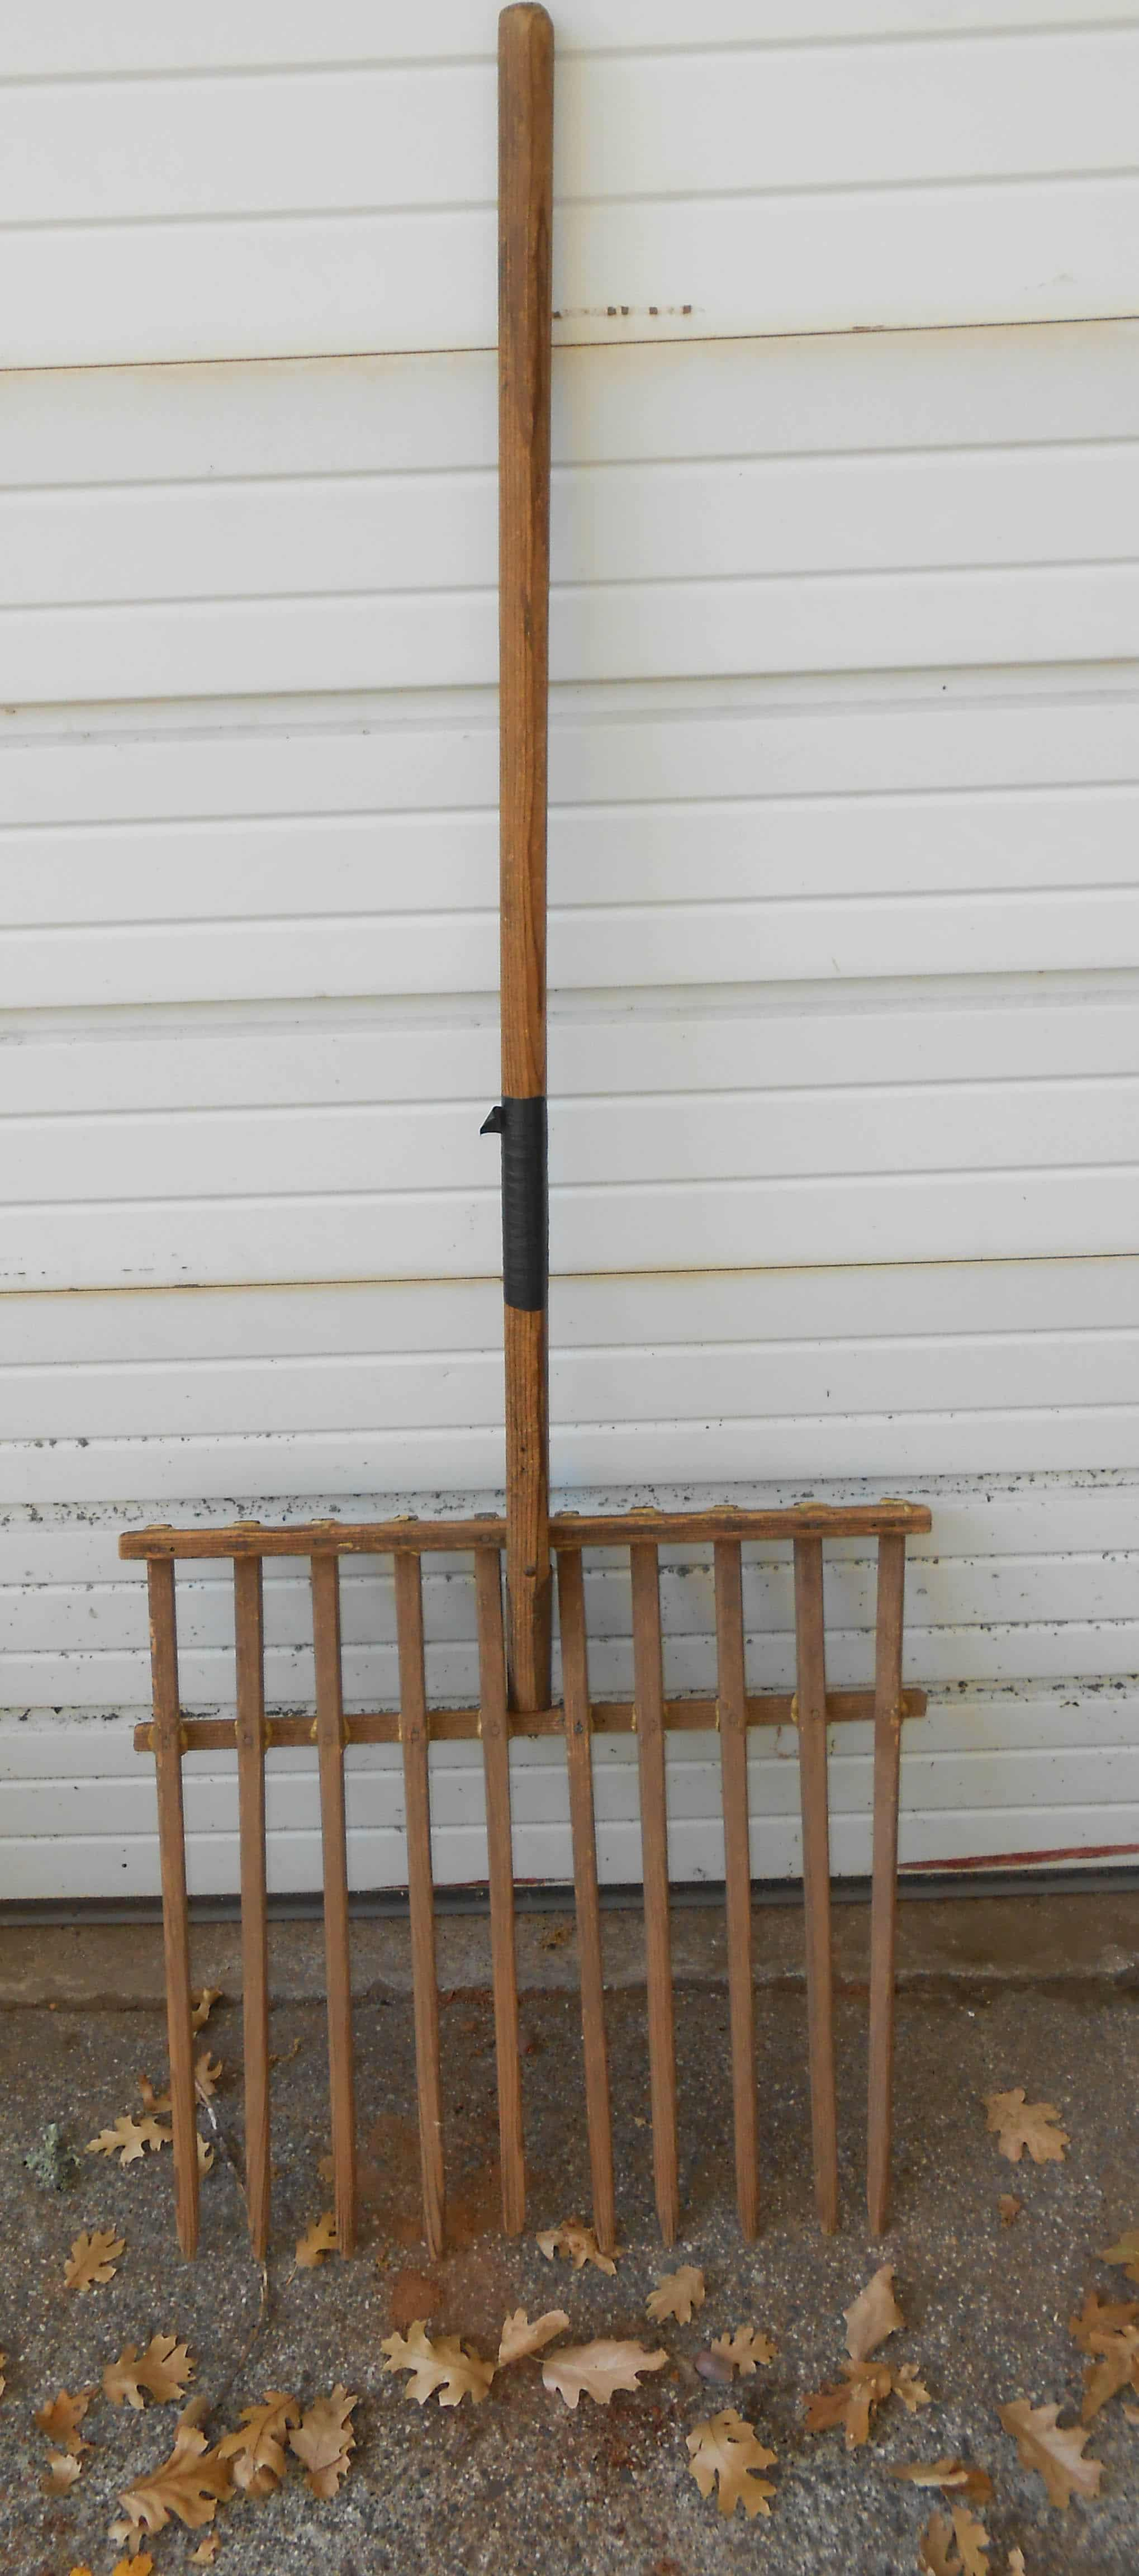 Homemade Wooden Gardening And Hay Forks Preparedness